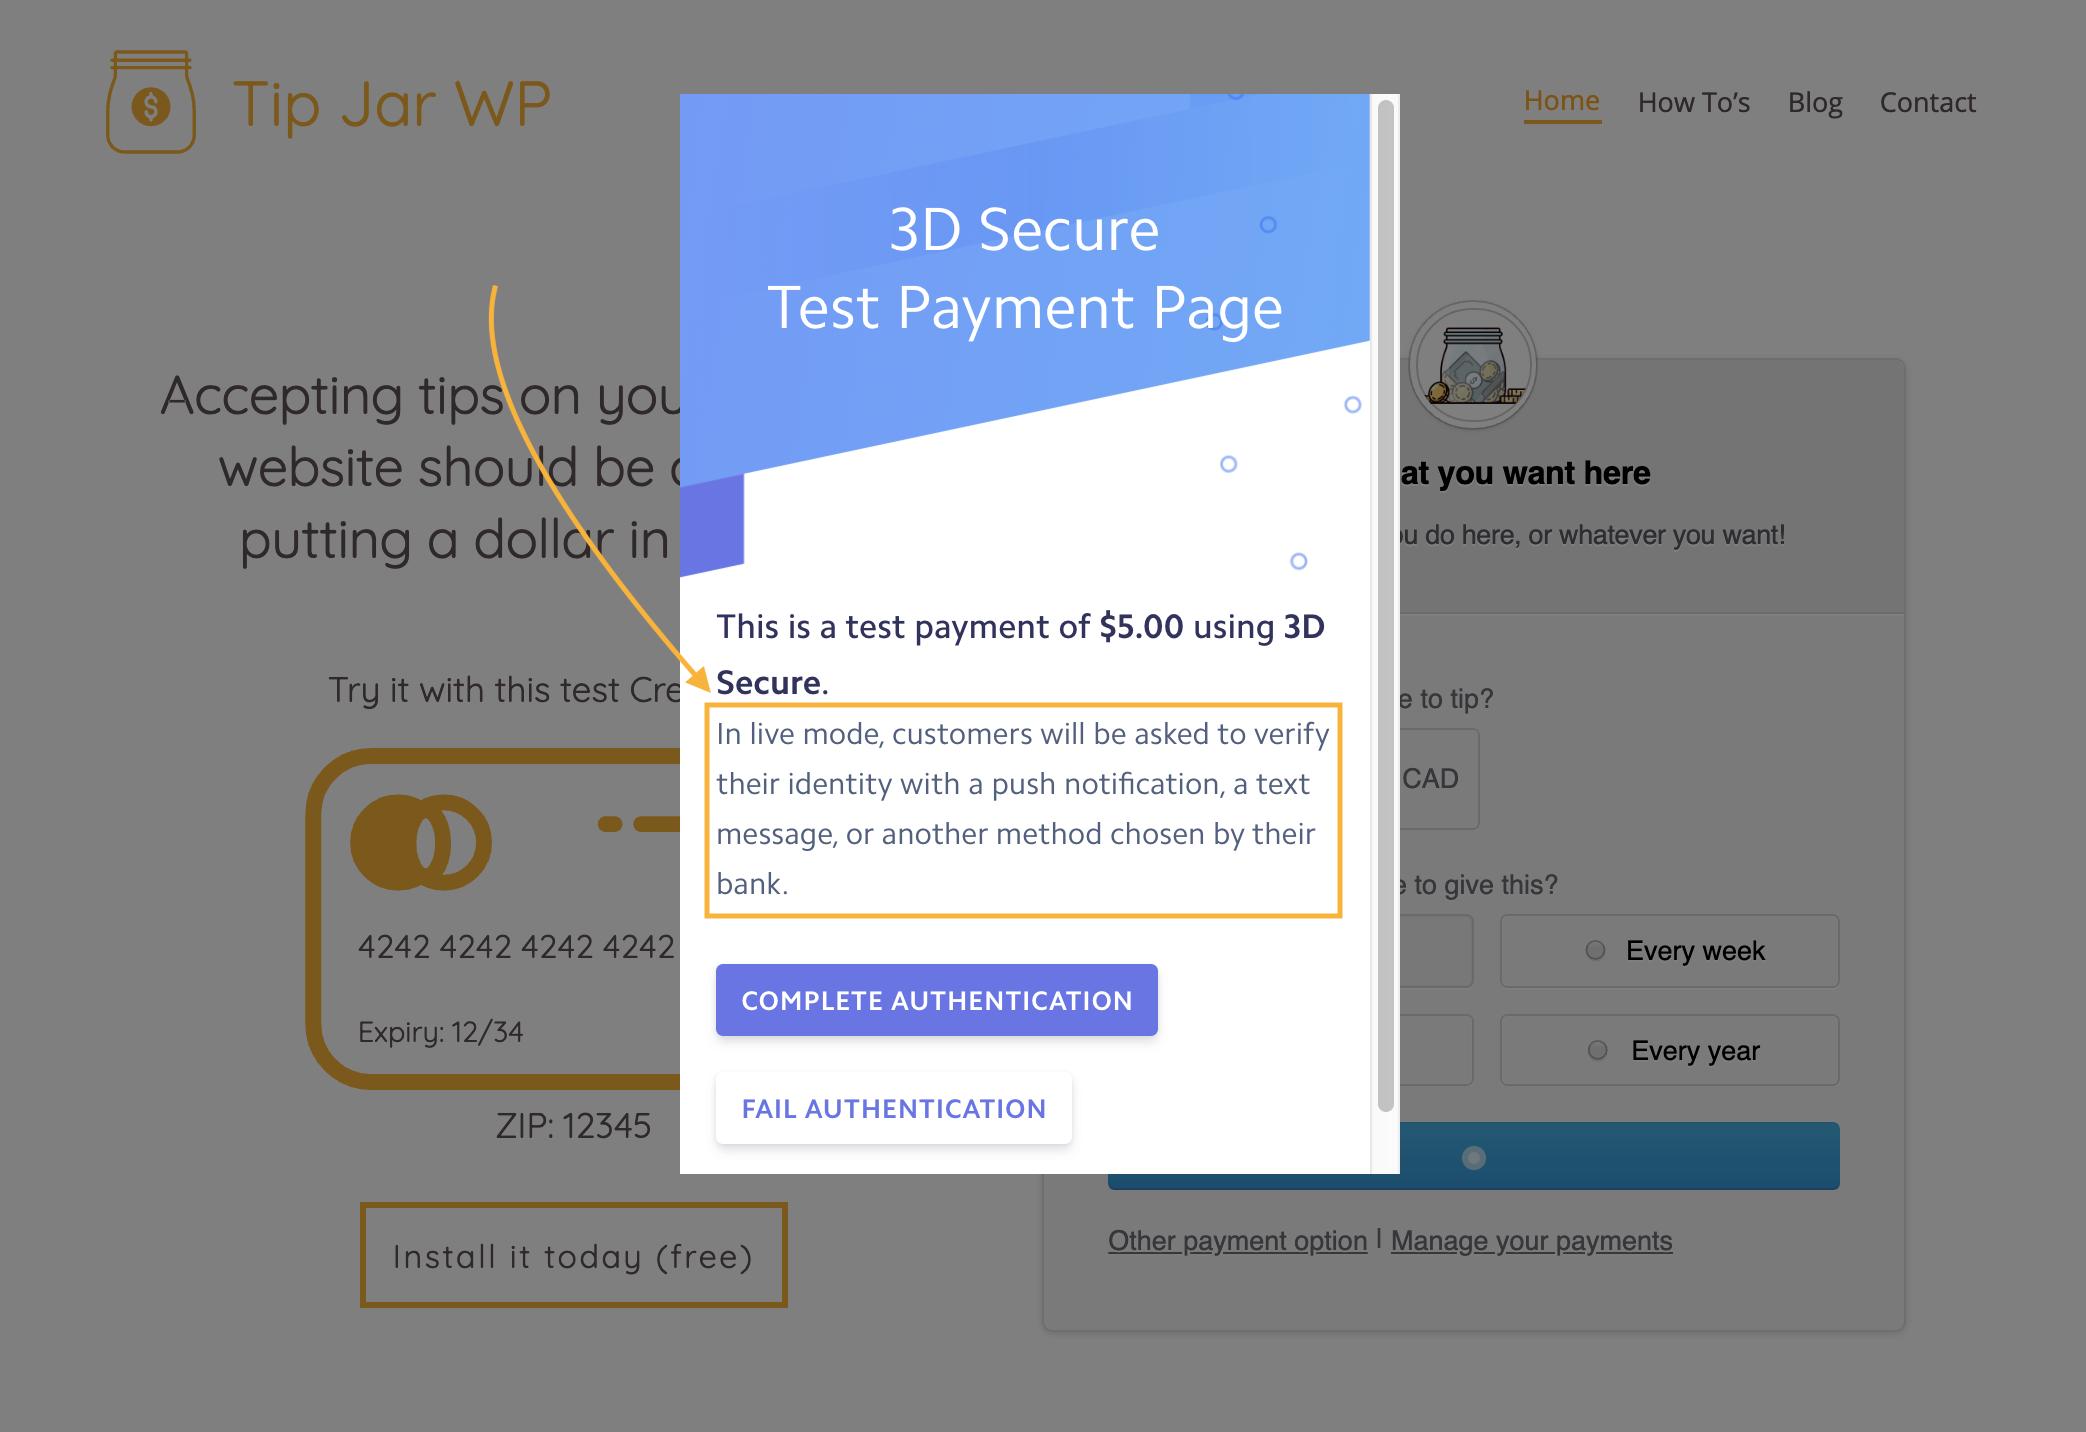 SCA and Stripe on WordPress (Tip Jar WP is ready!) - Tip Jar WP